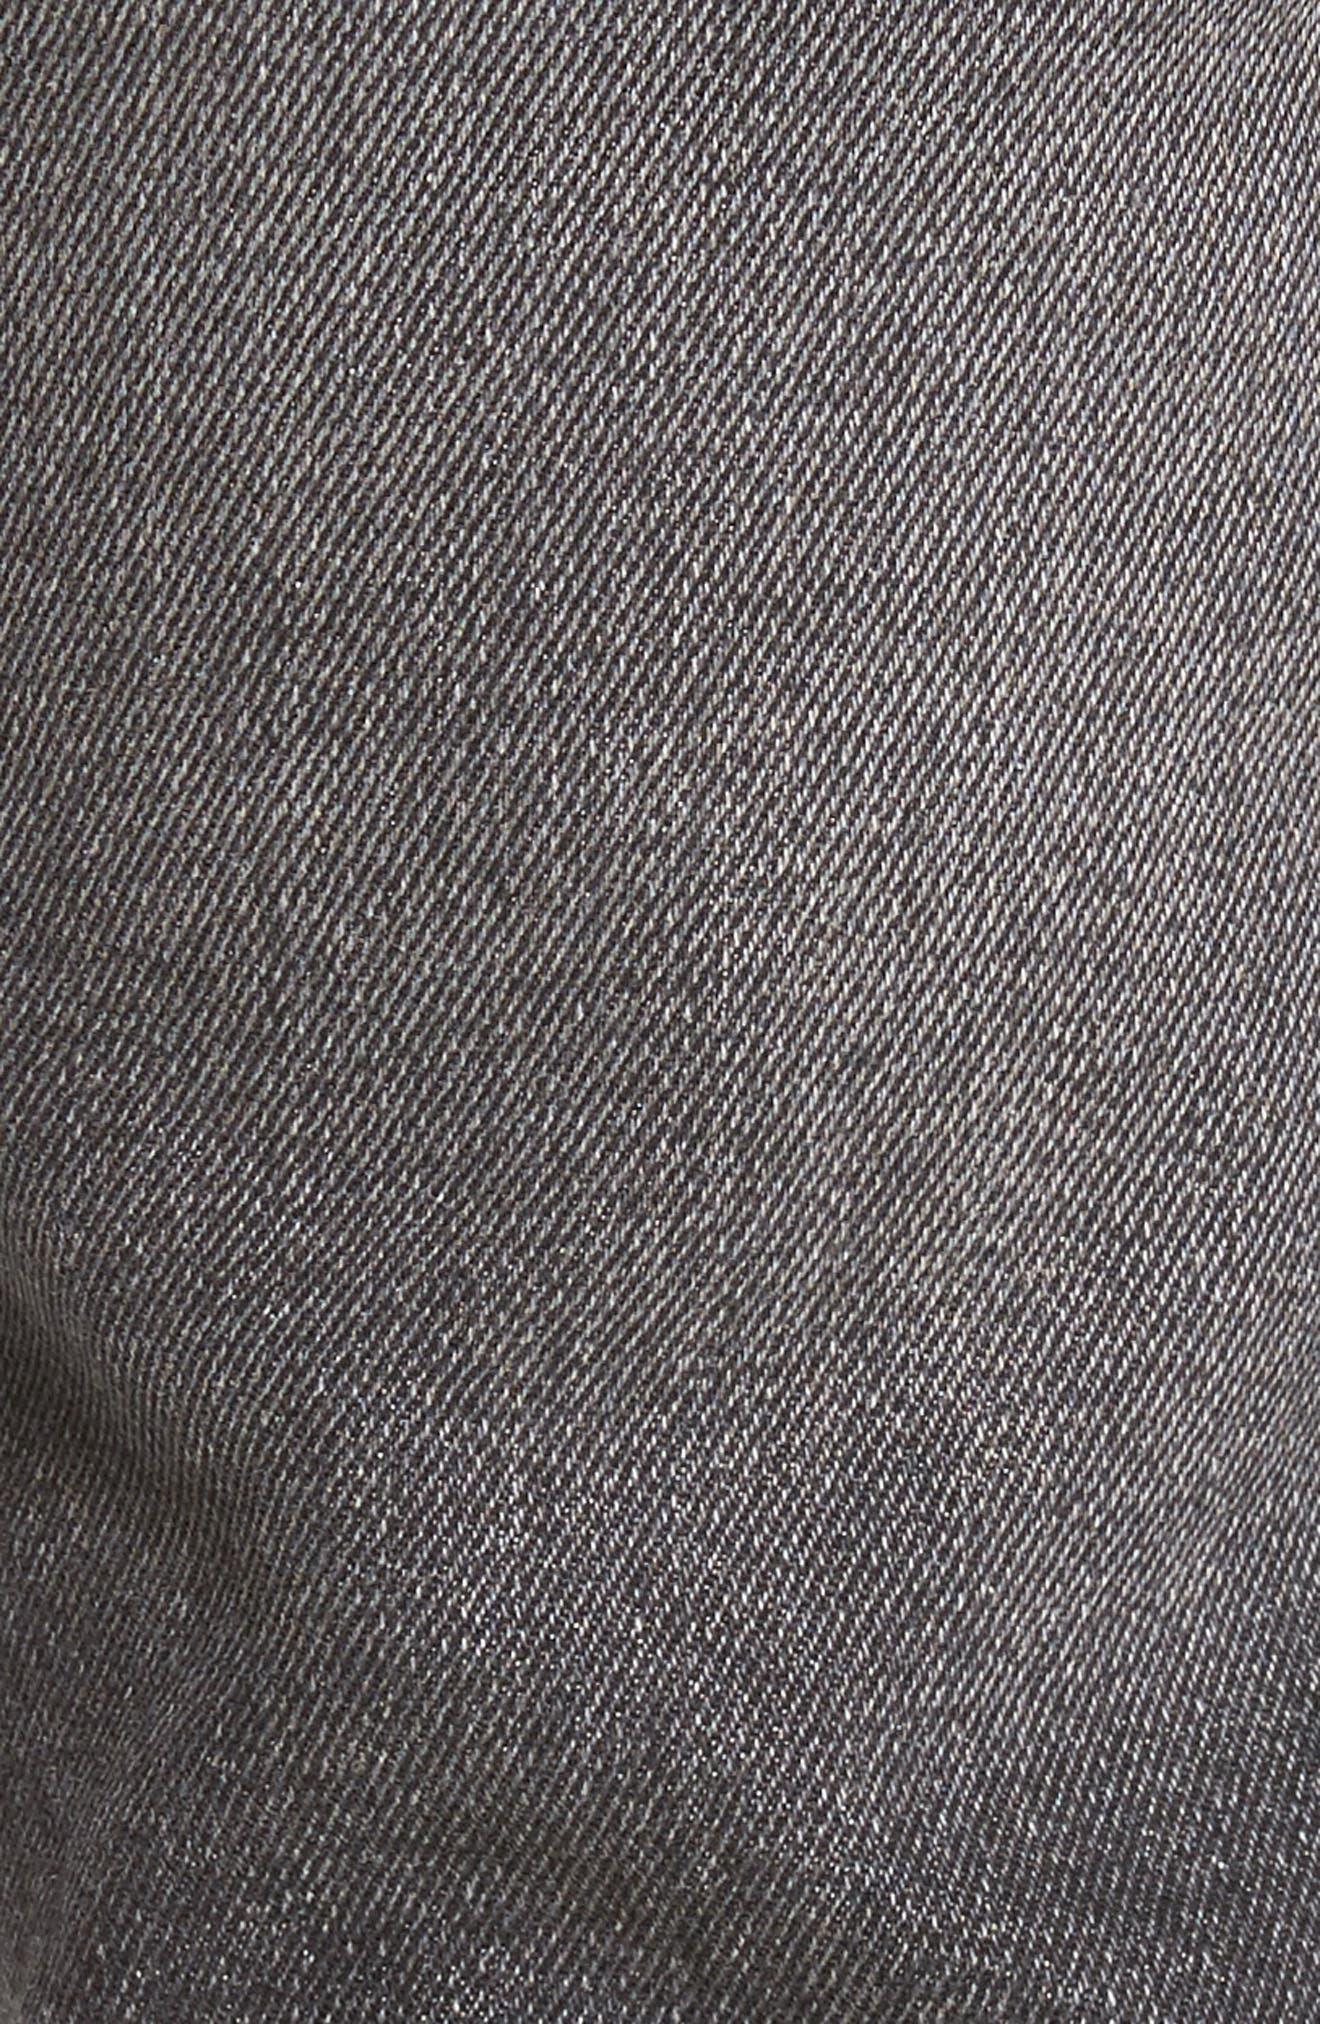 Skinny Jeans,                             Alternate thumbnail 5, color,                             001